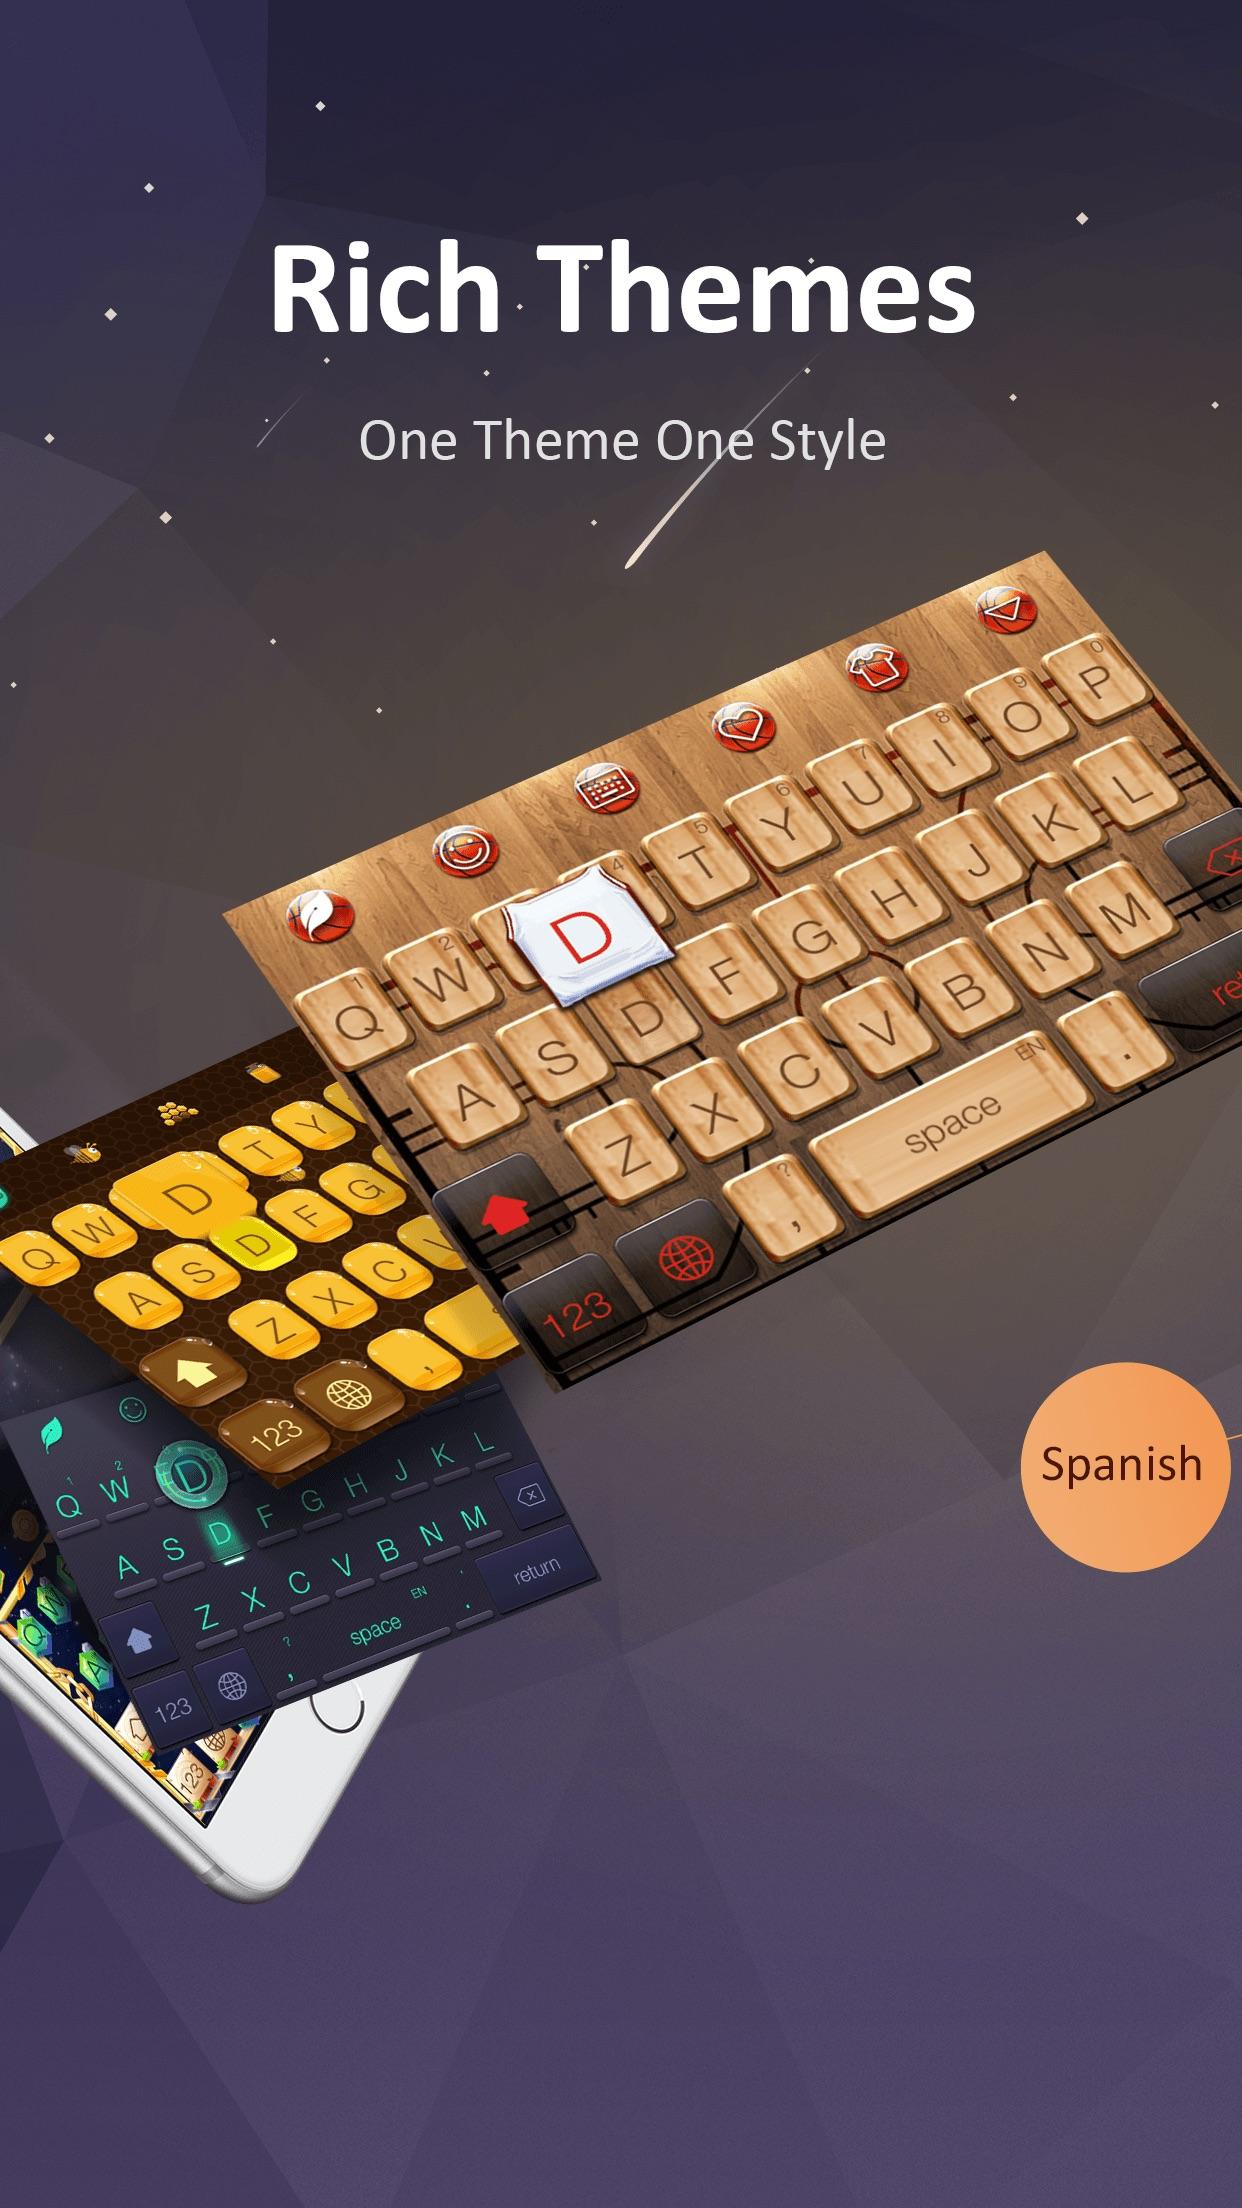 GO Keyboard - Emojis with Cool Themes Screenshot